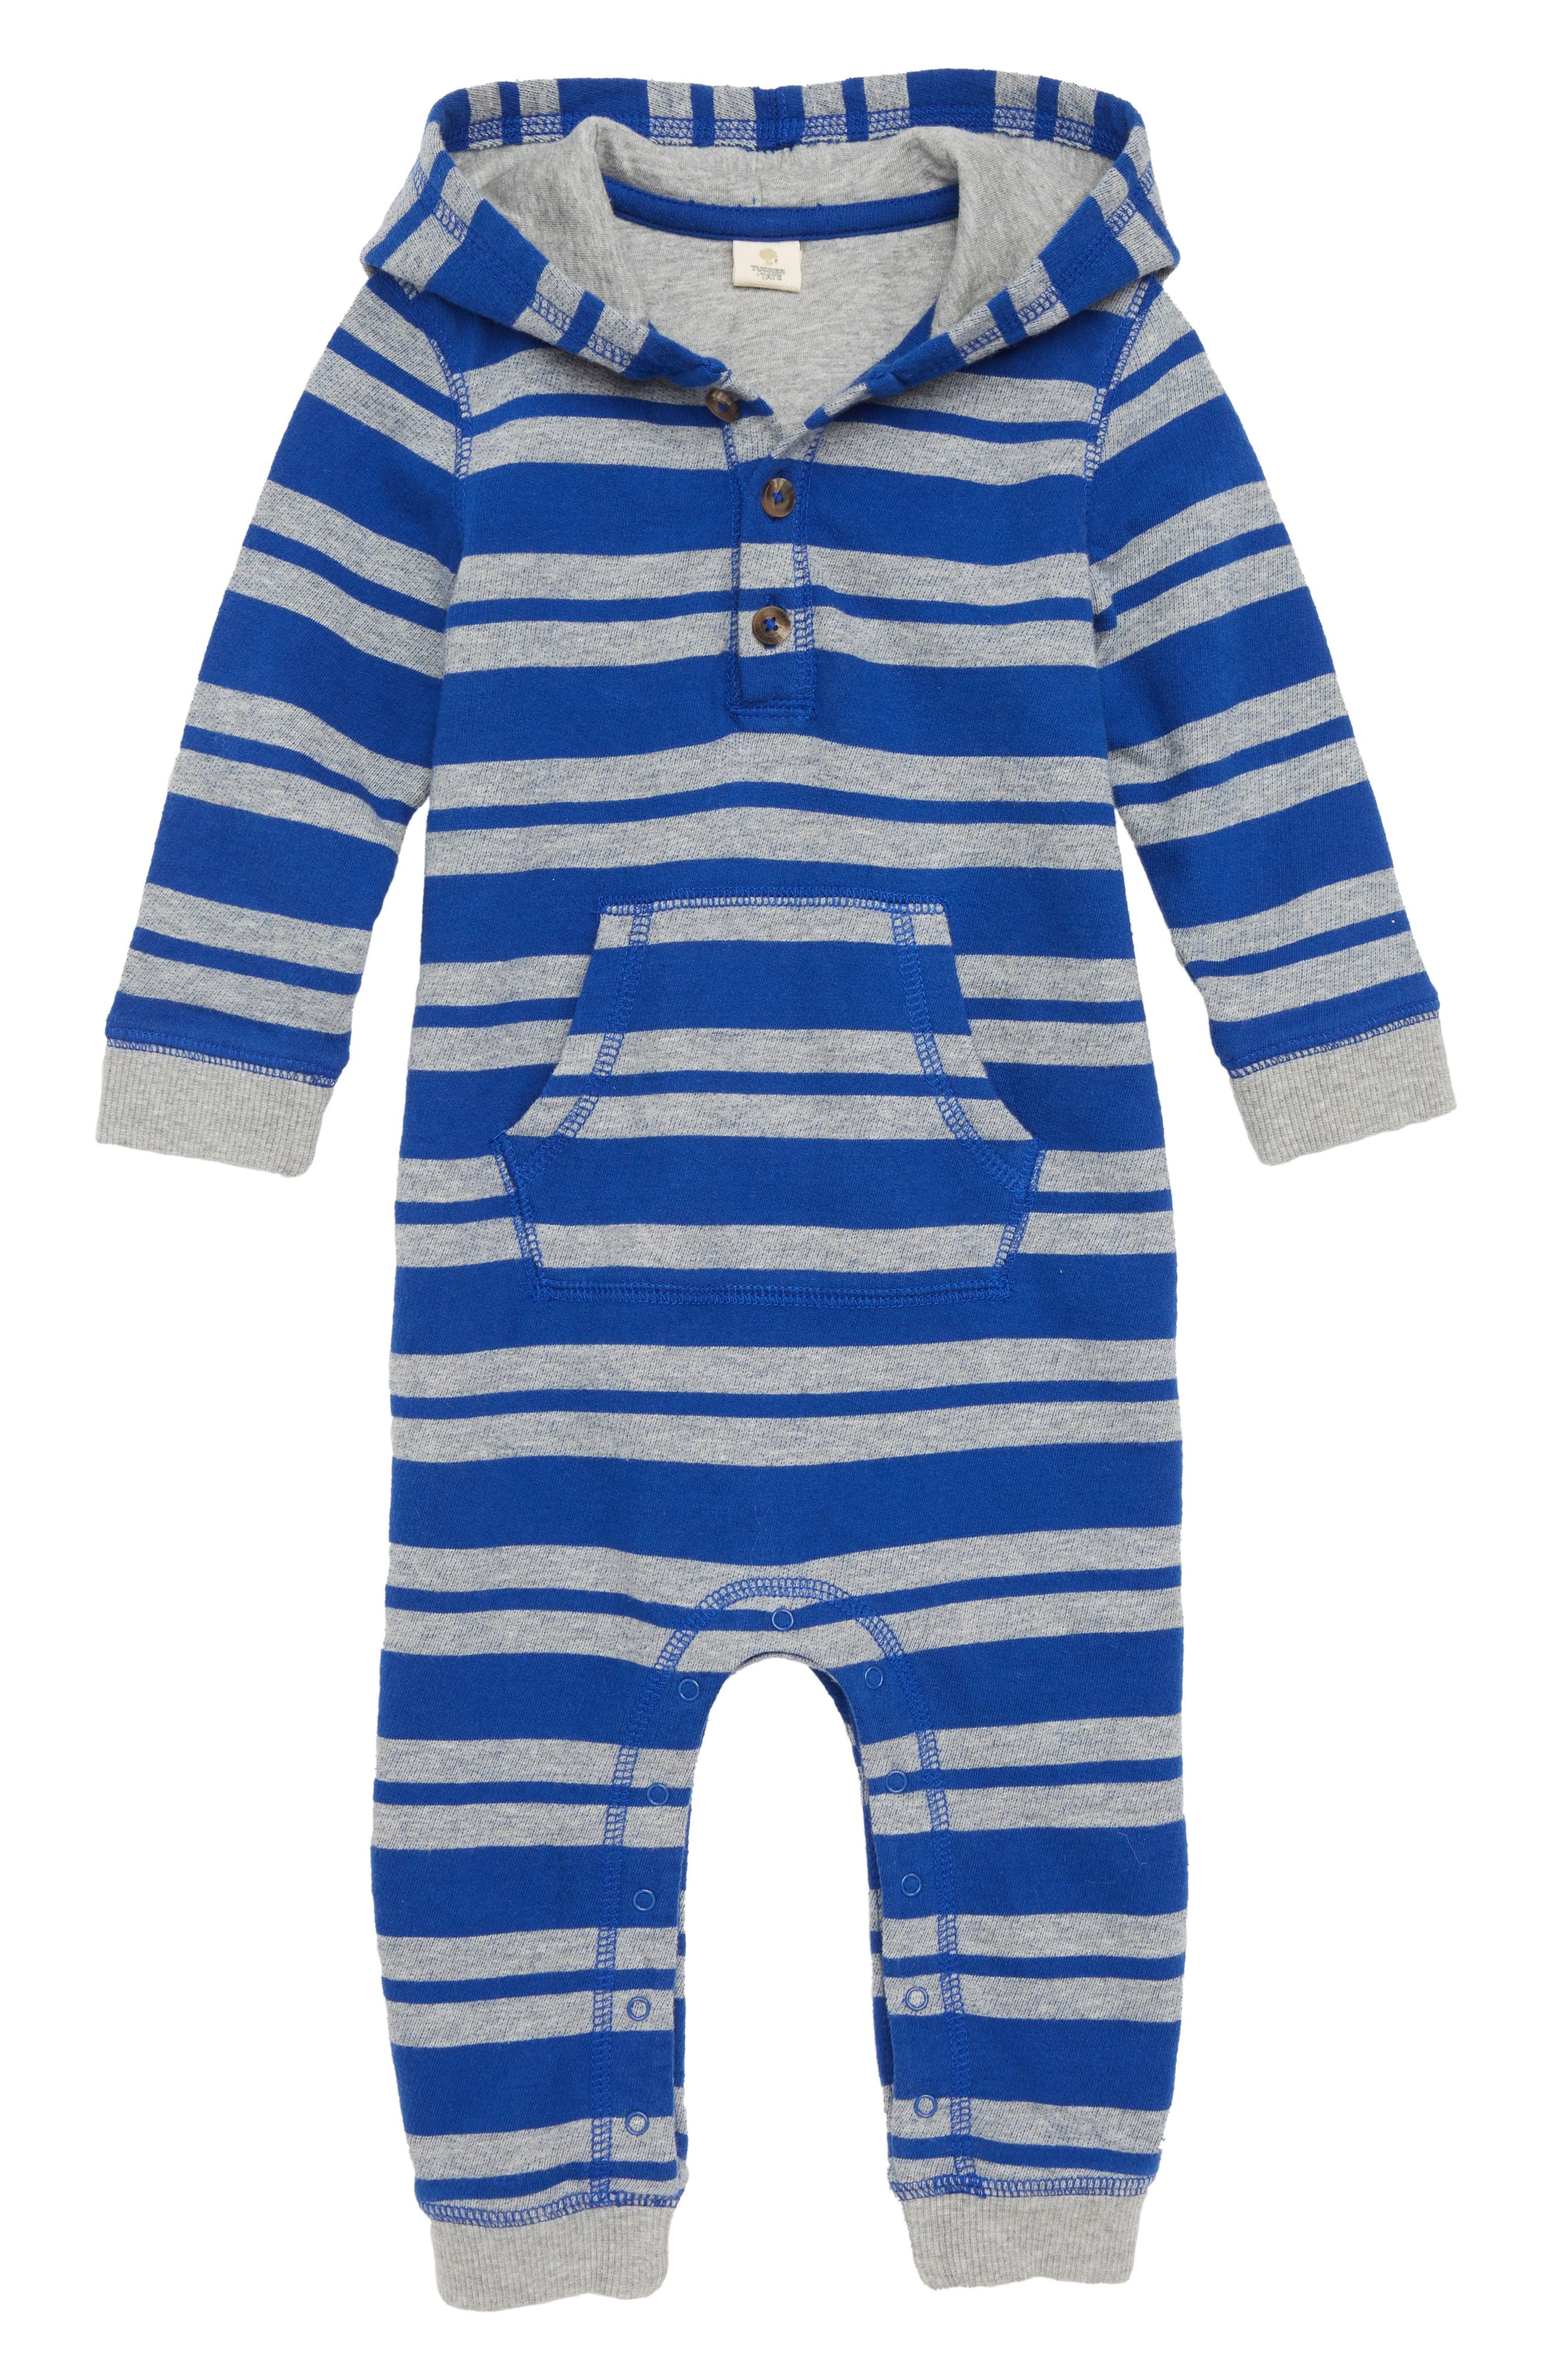 Stripe Hooded Romper,                         Main,                         color, BLUE MAZARINE- GREY STRIPE